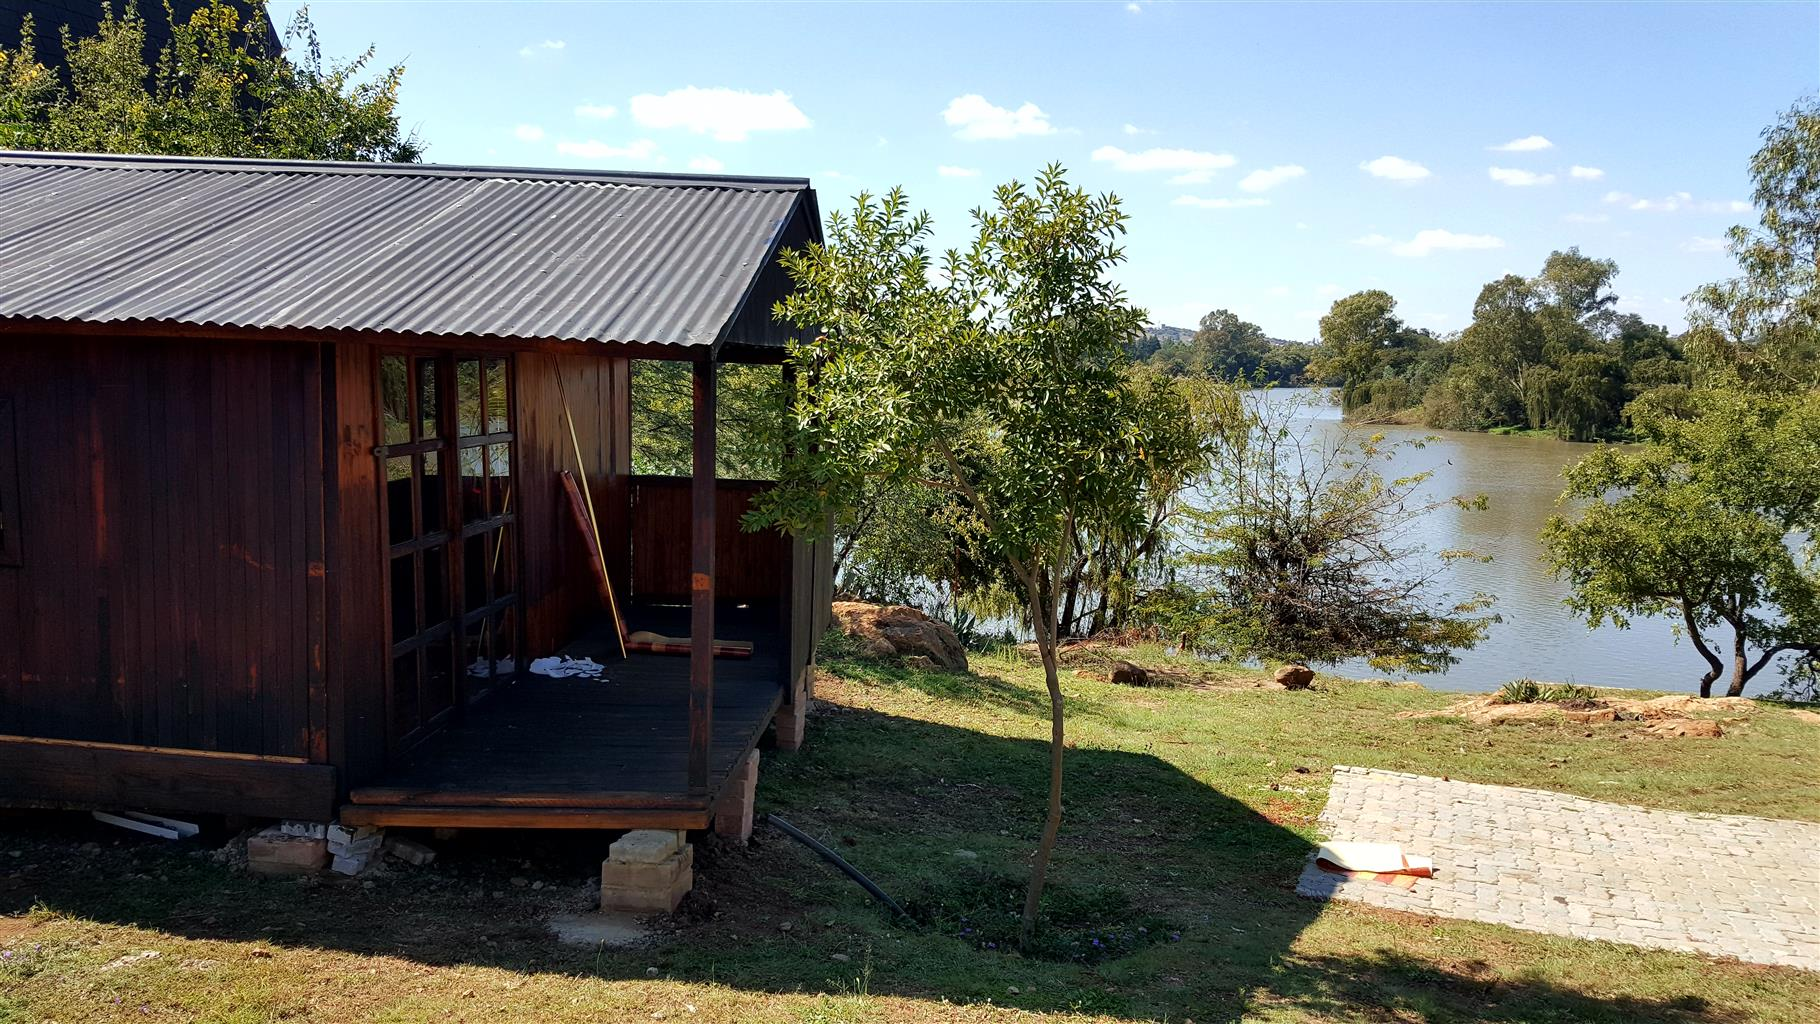 Vaal River Farm and Holiday Resort